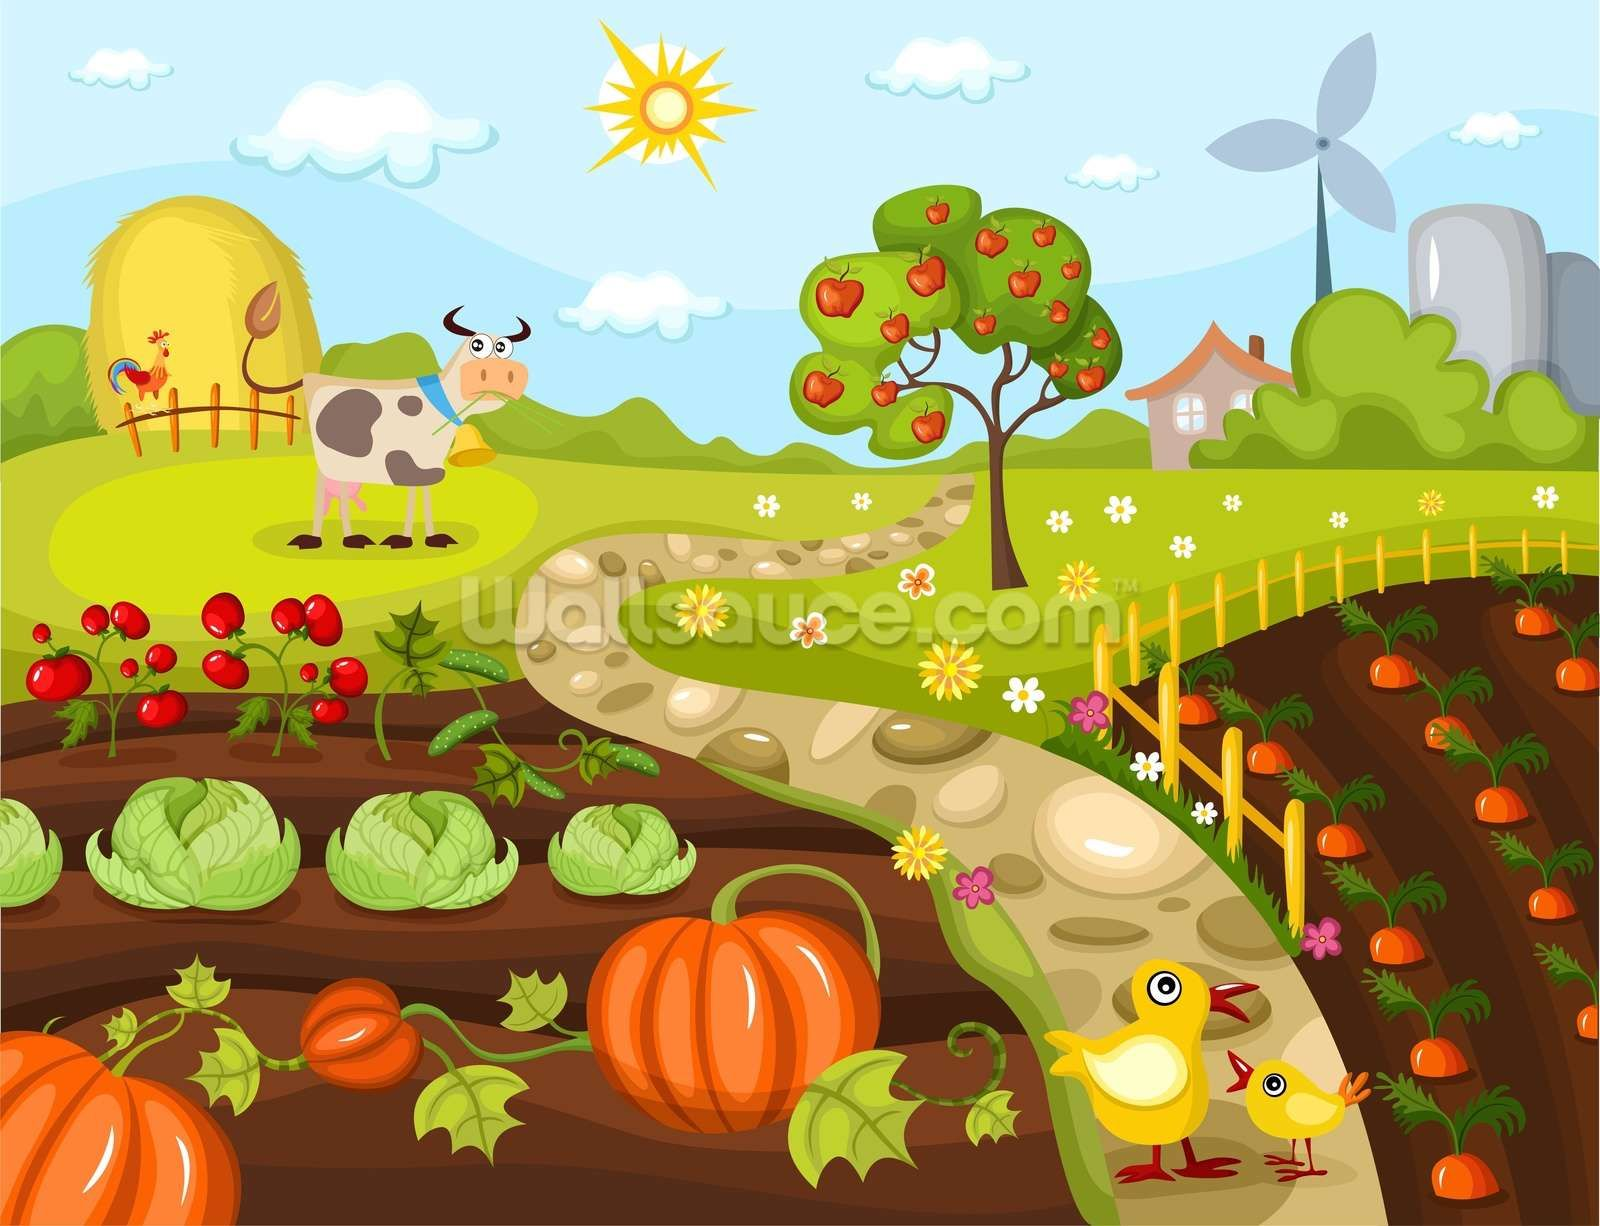 Harvest Time Wallpaper Wallsauce Us In 2021 Garden Clipart Farm Images Illustration